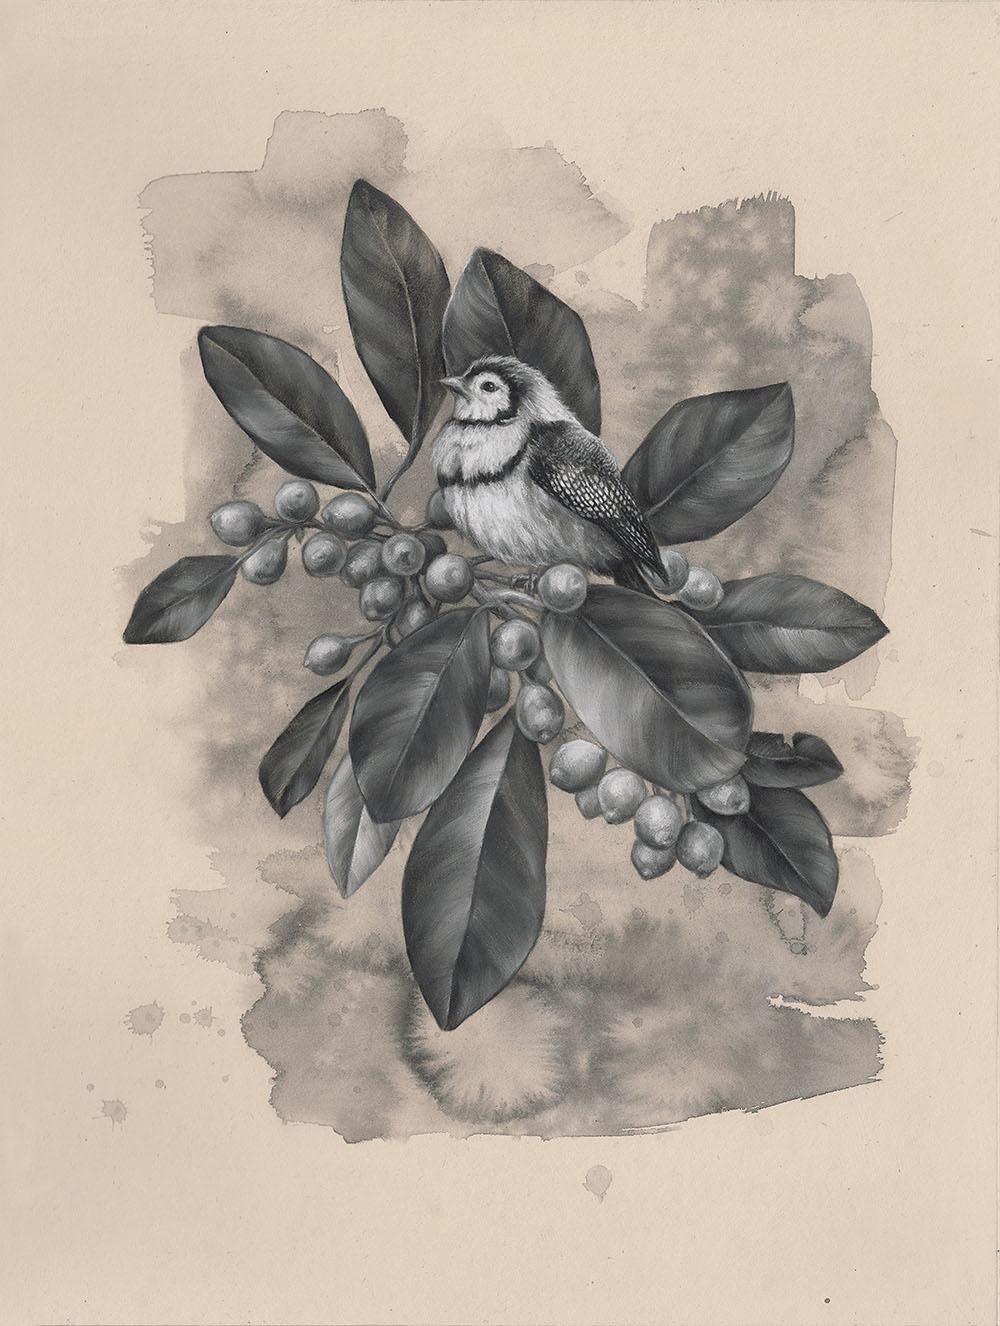 Owl Finch: 6Series 1.3